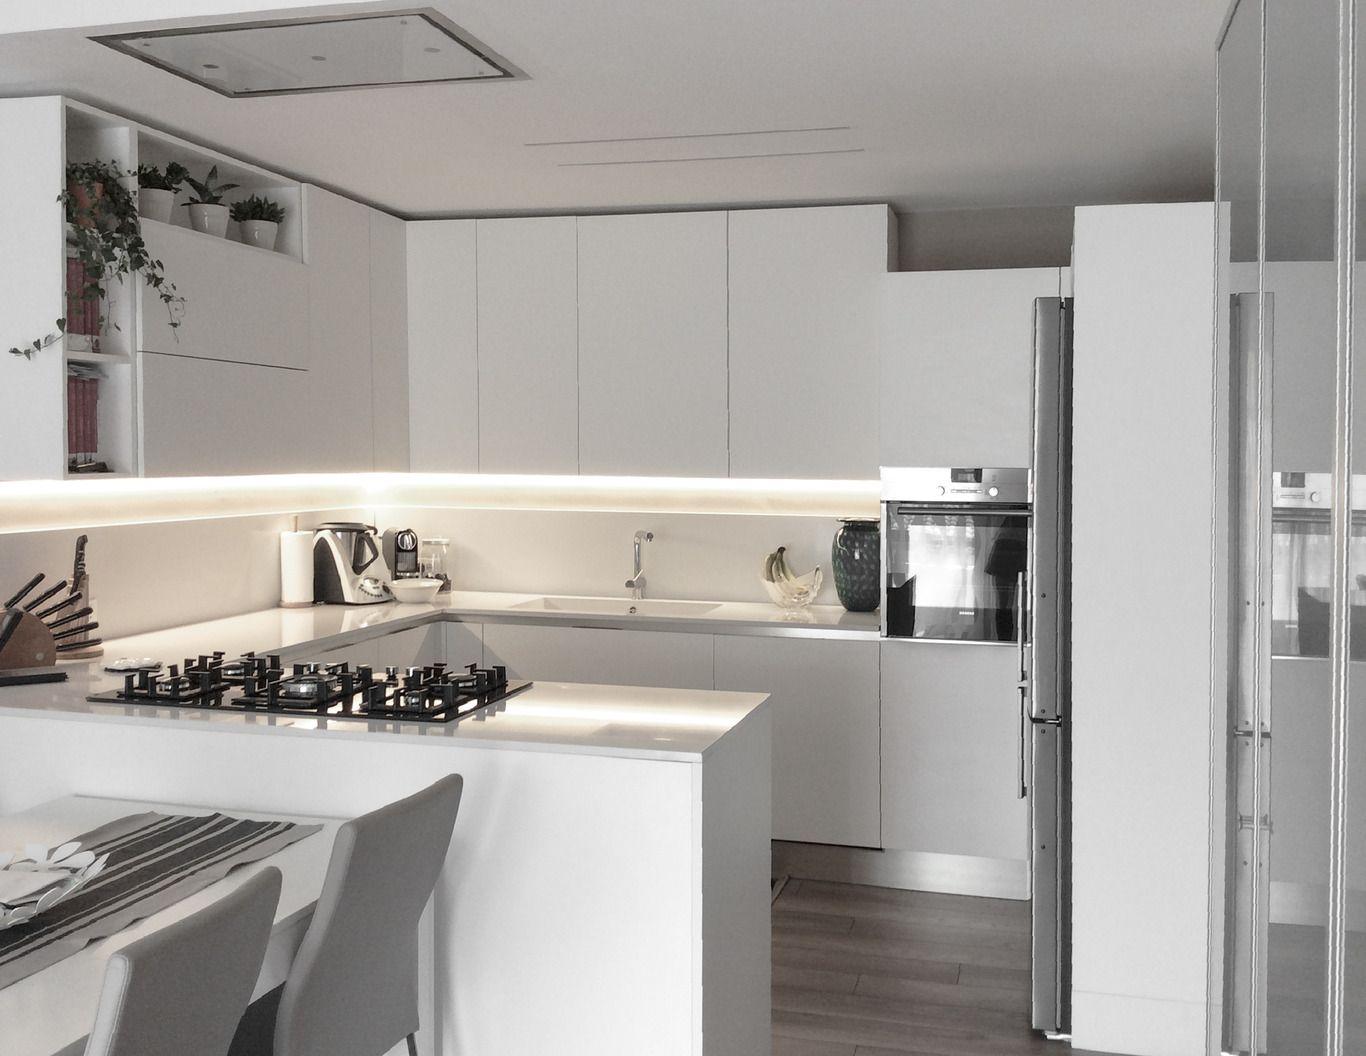 La cucina Start-Time.GO di Lisa | Veneta Cucine | Kitchenns ...